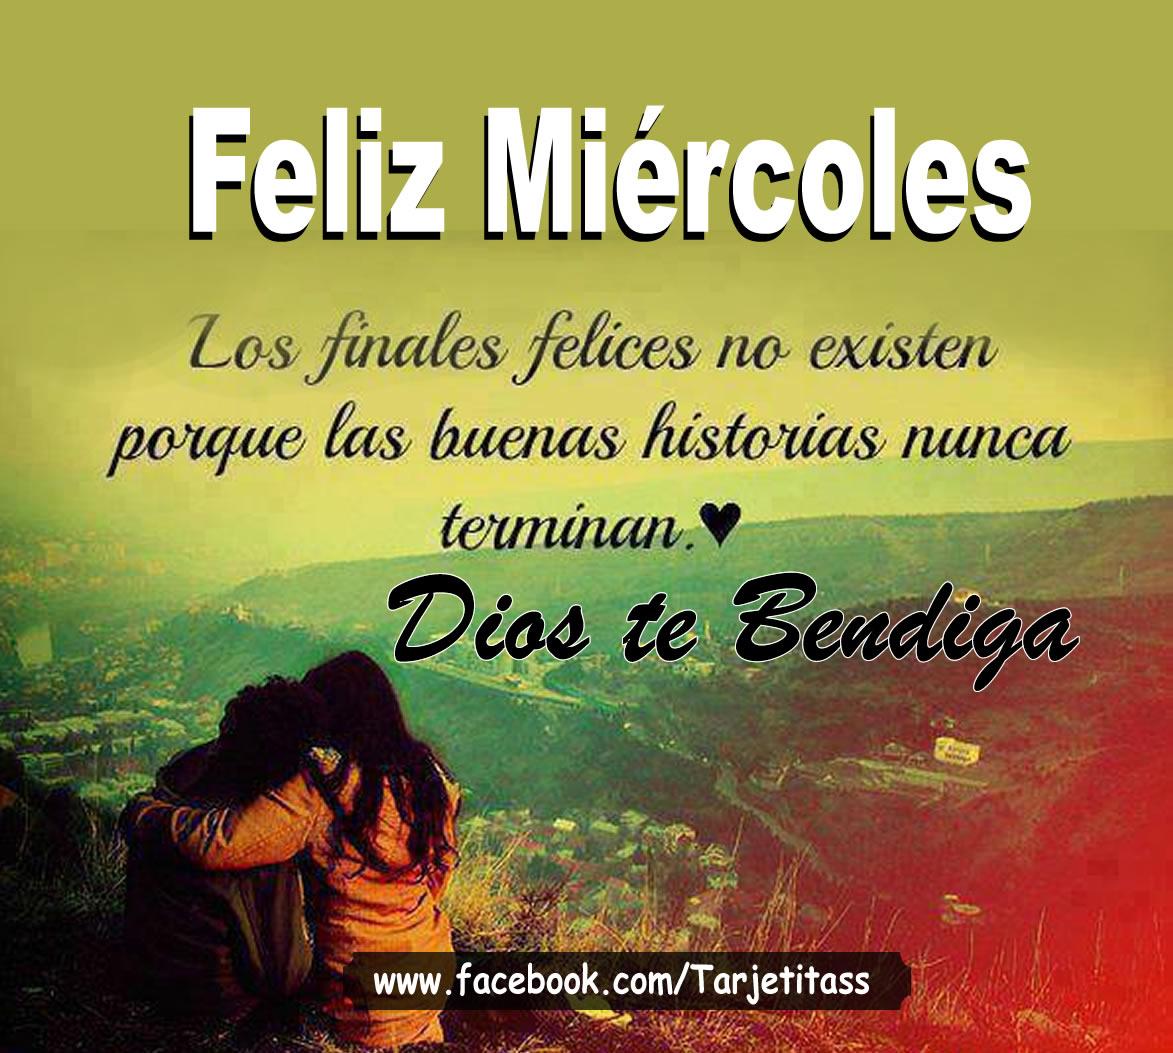 Feliz Miercoles Dios Te bendiga Mi Amor